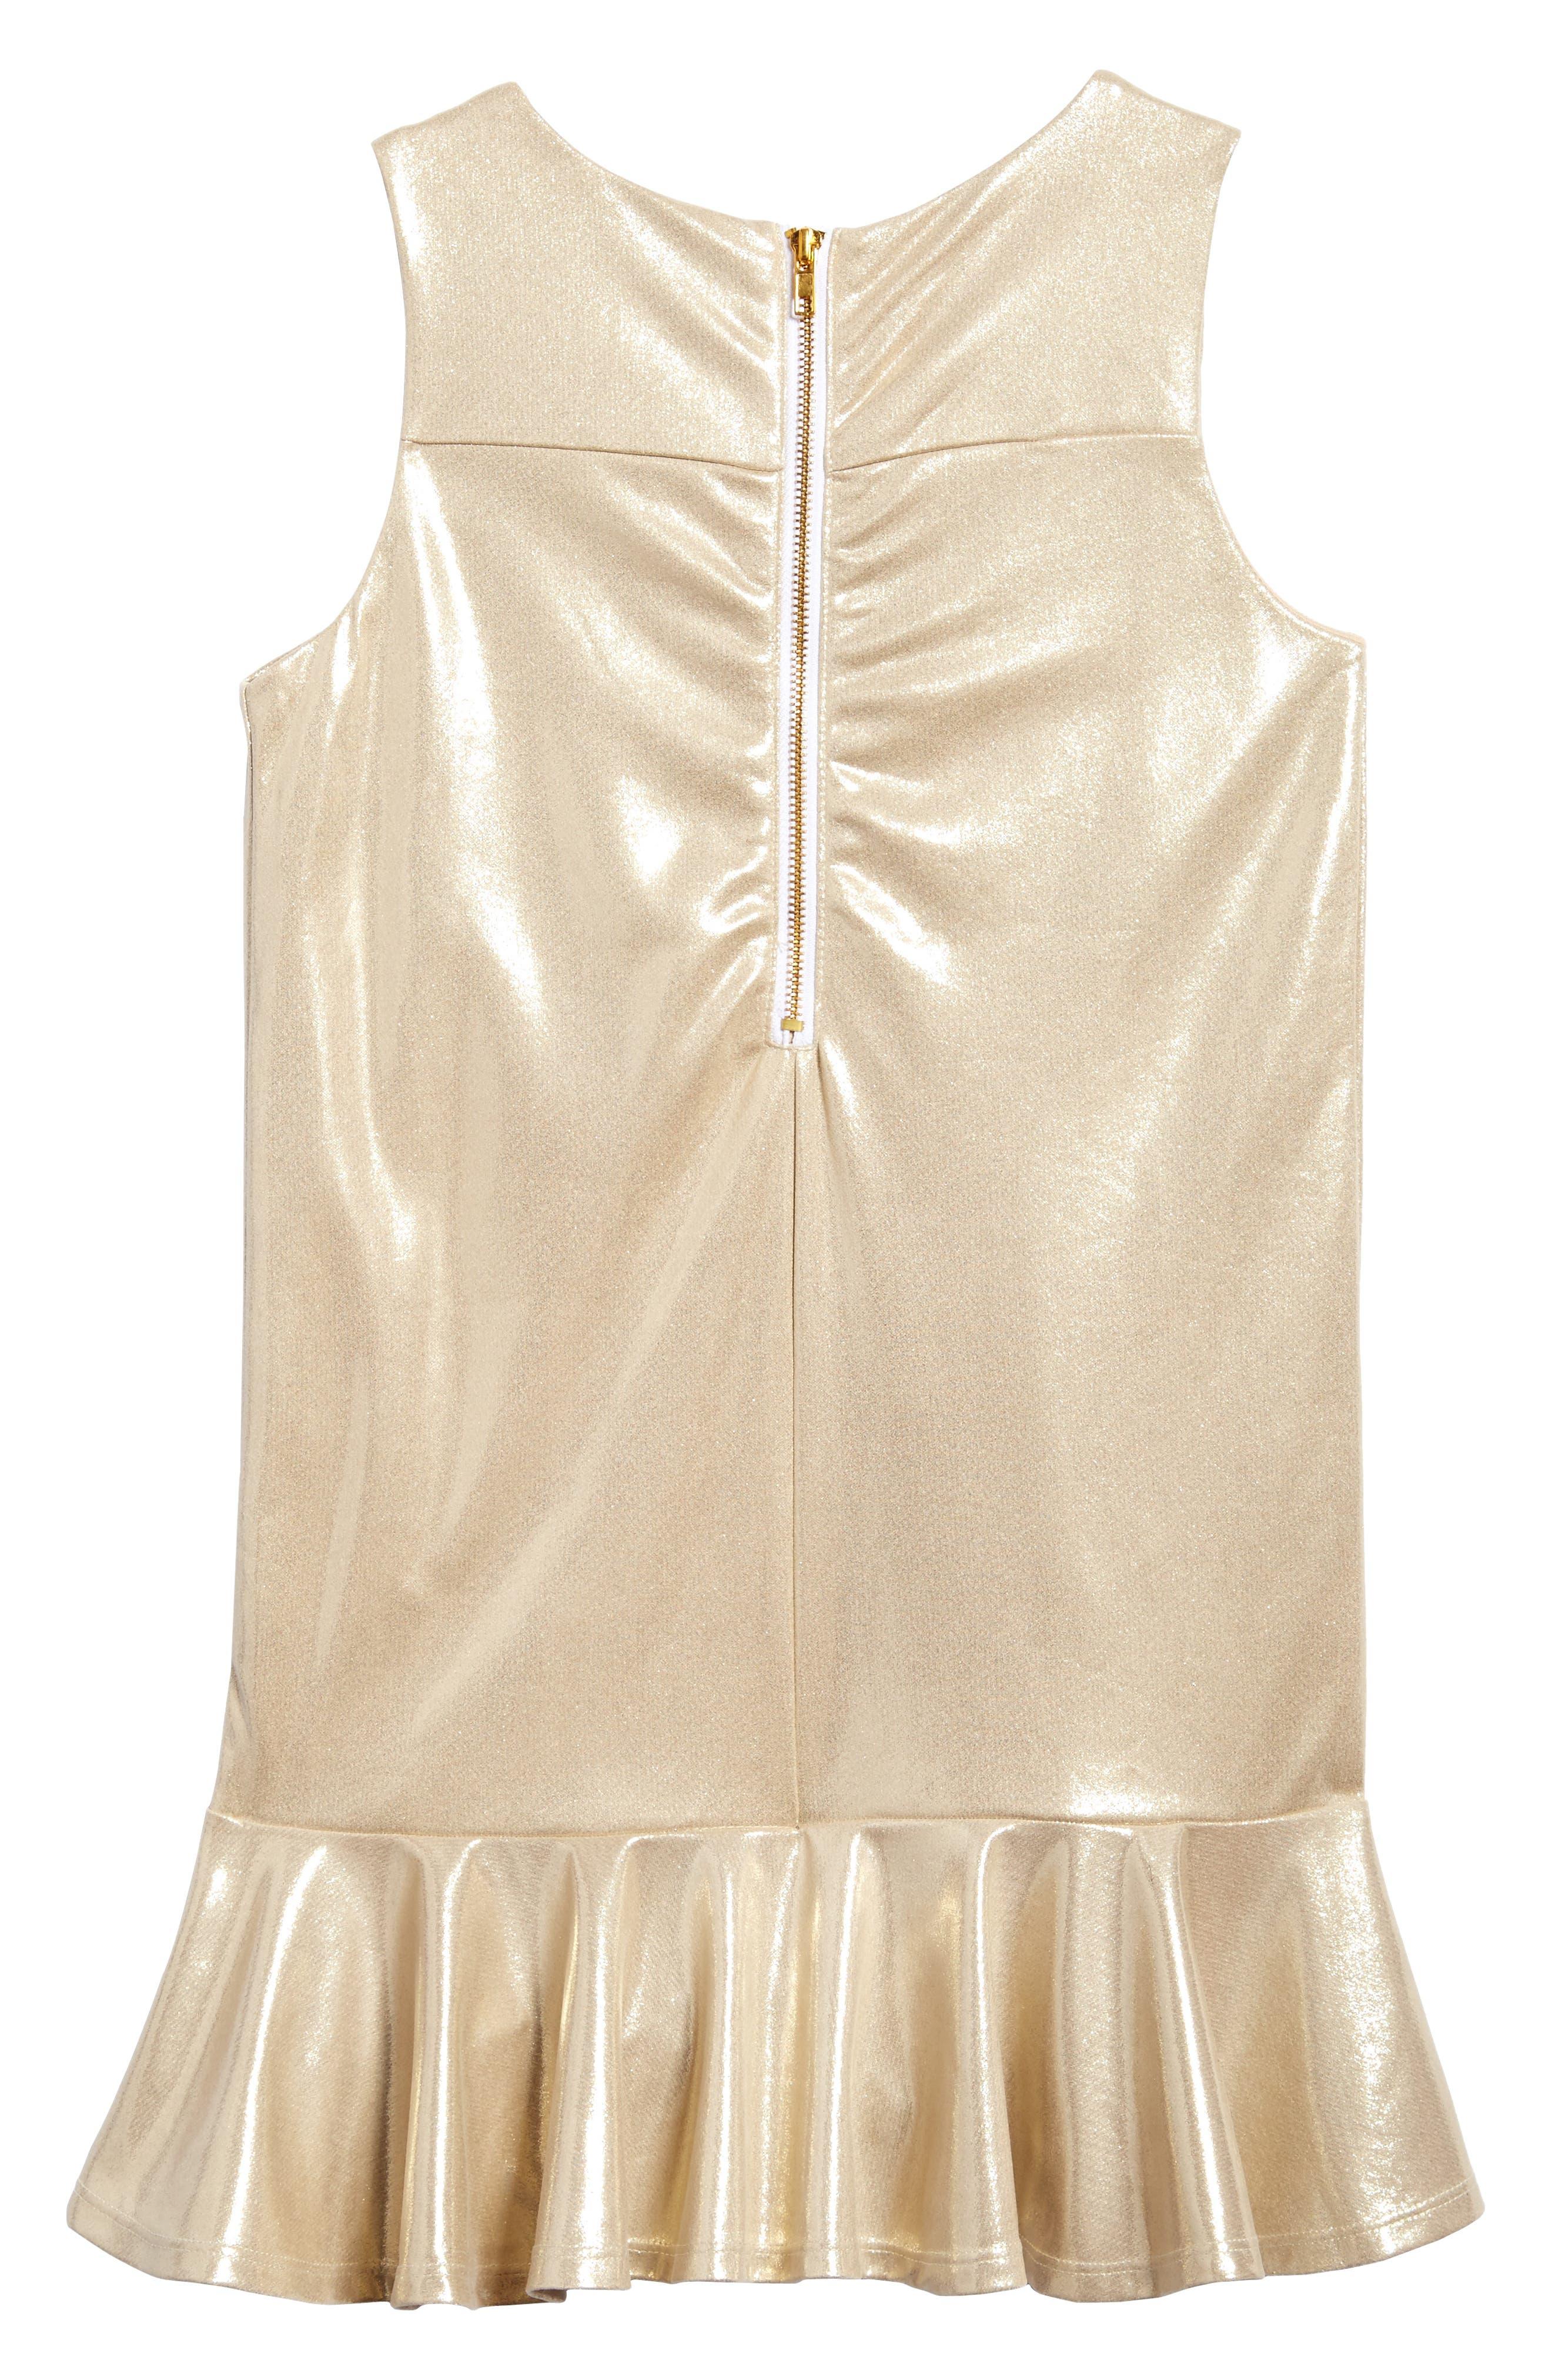 Liquid Shine Dress,                             Alternate thumbnail 2, color,                             710